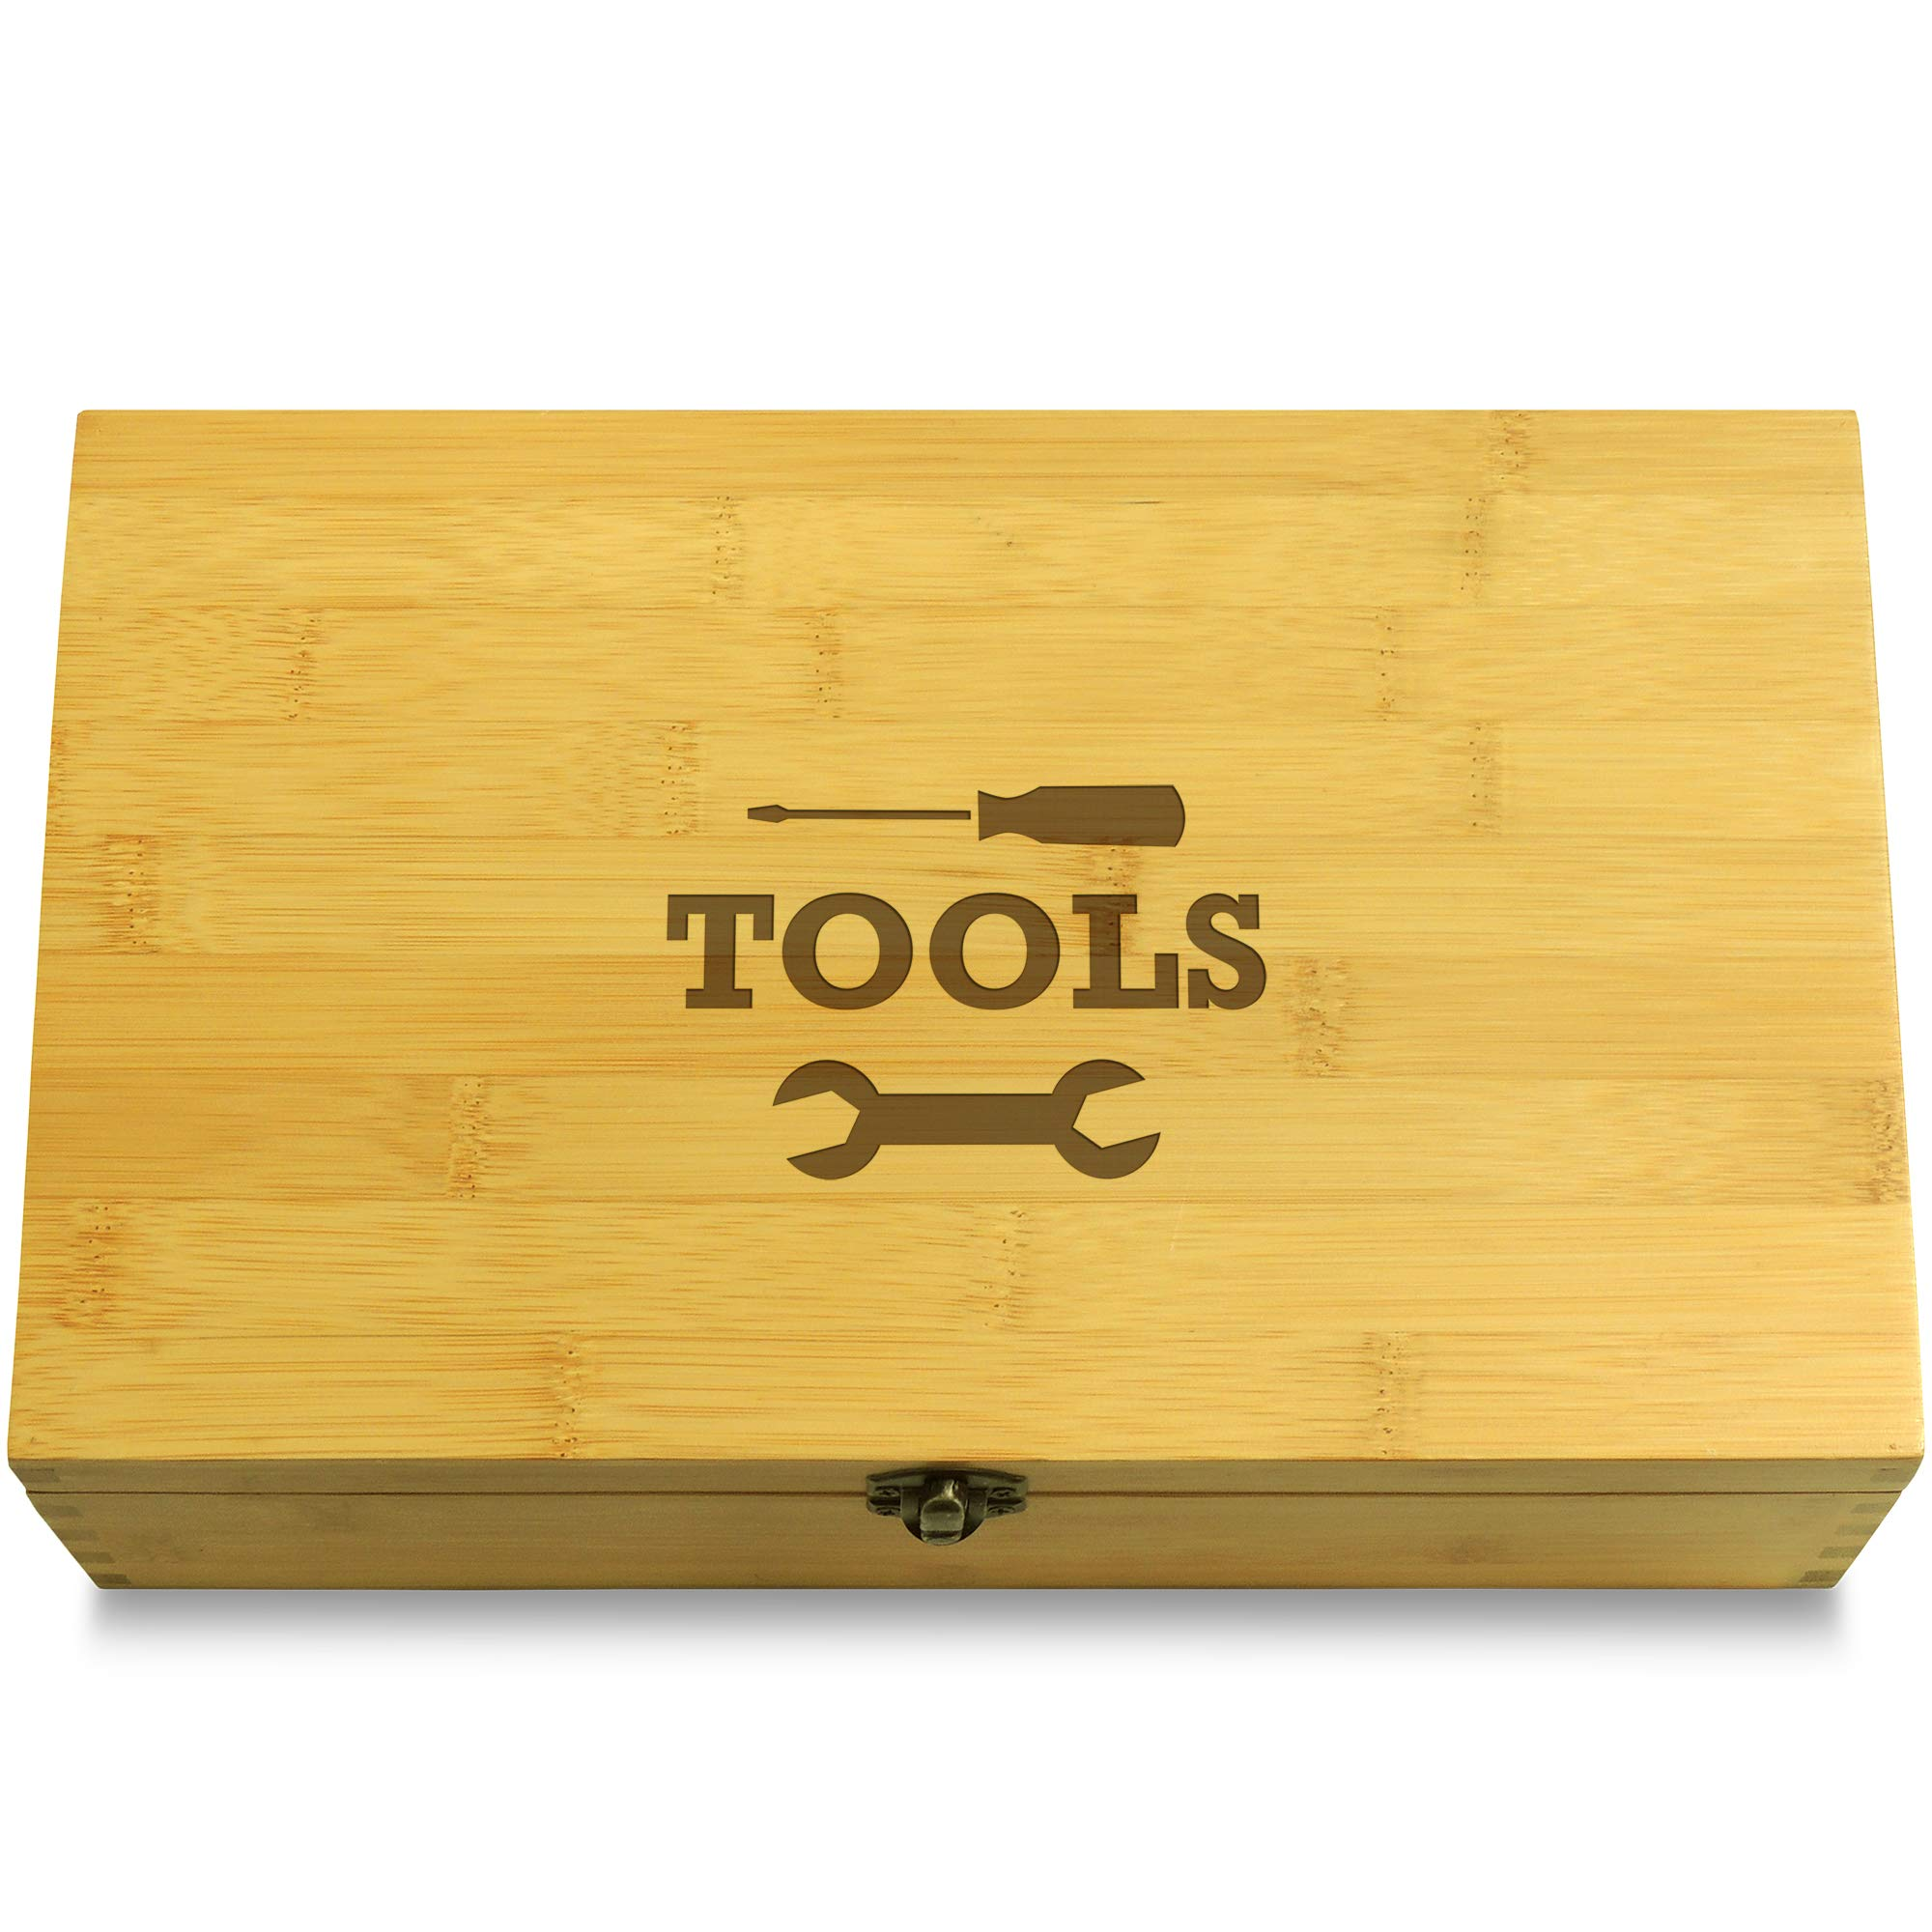 Cookbook People Wrench & Screwdriver Tools Workshop Multikeep Box - Memento Wood Adjustable Organizer